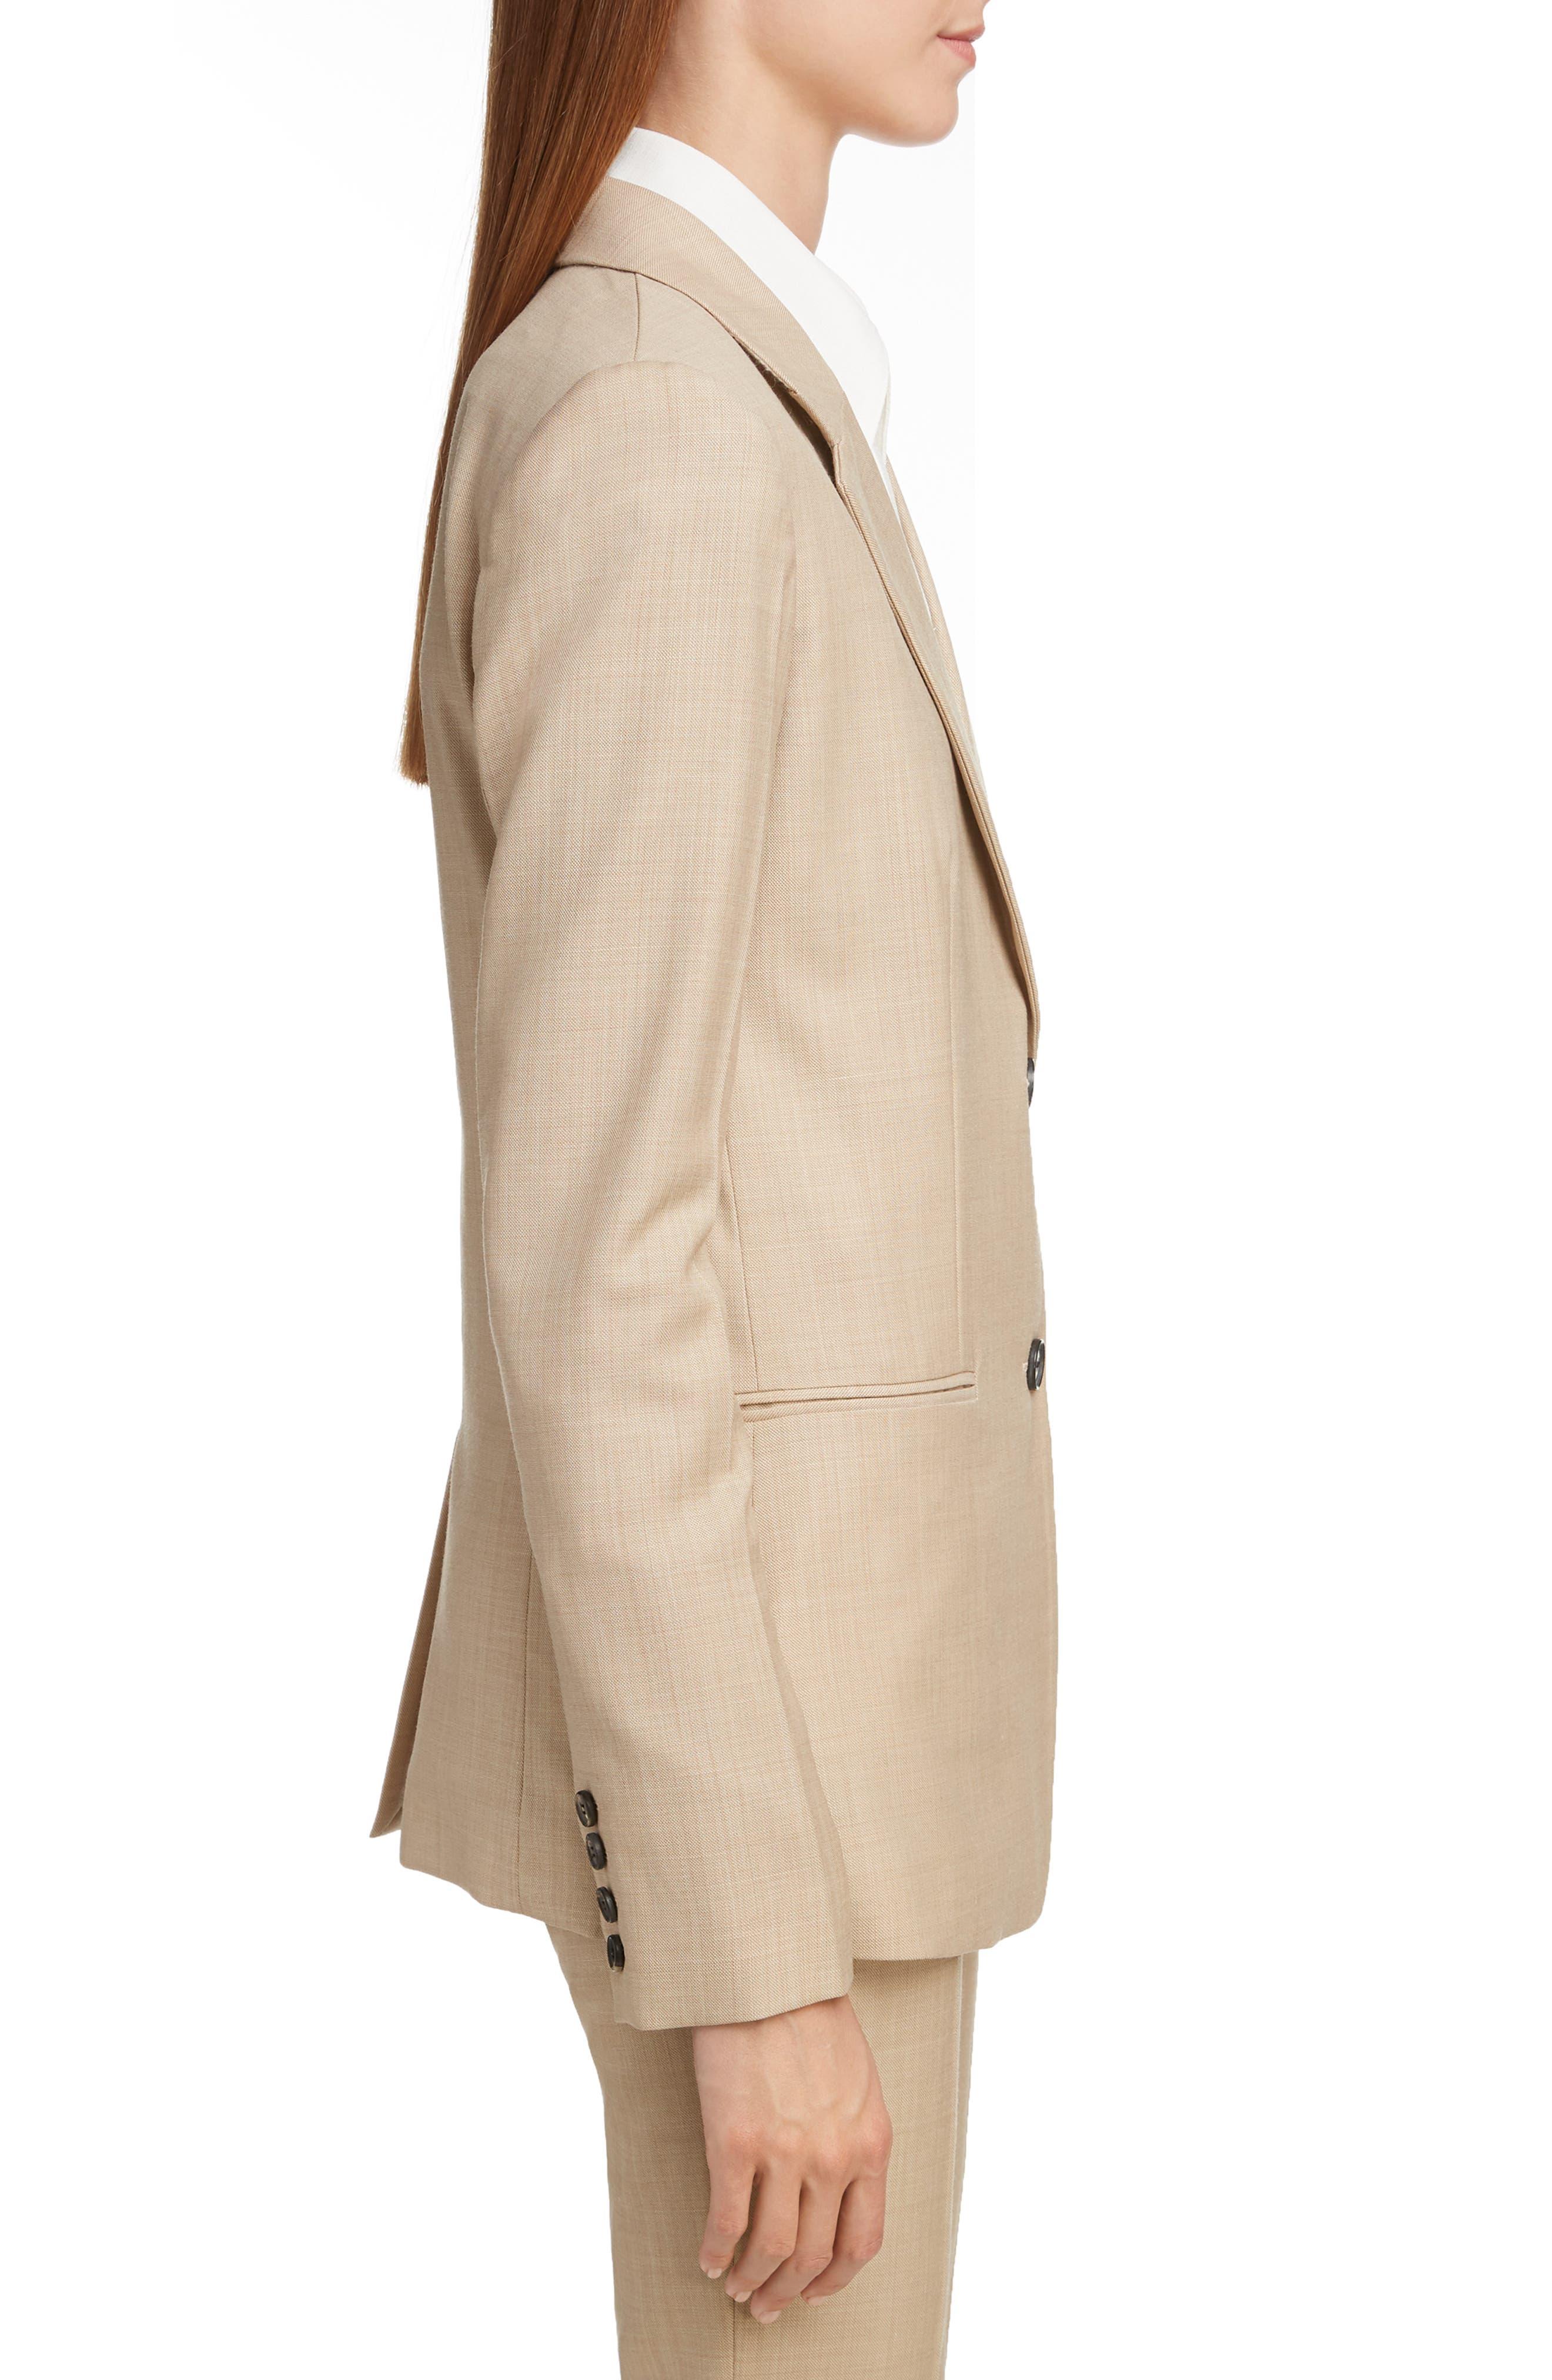 VICTORIA BECKHAM, Wool Jacket, Alternate thumbnail 3, color, LIGHT BEIGE-WHITE